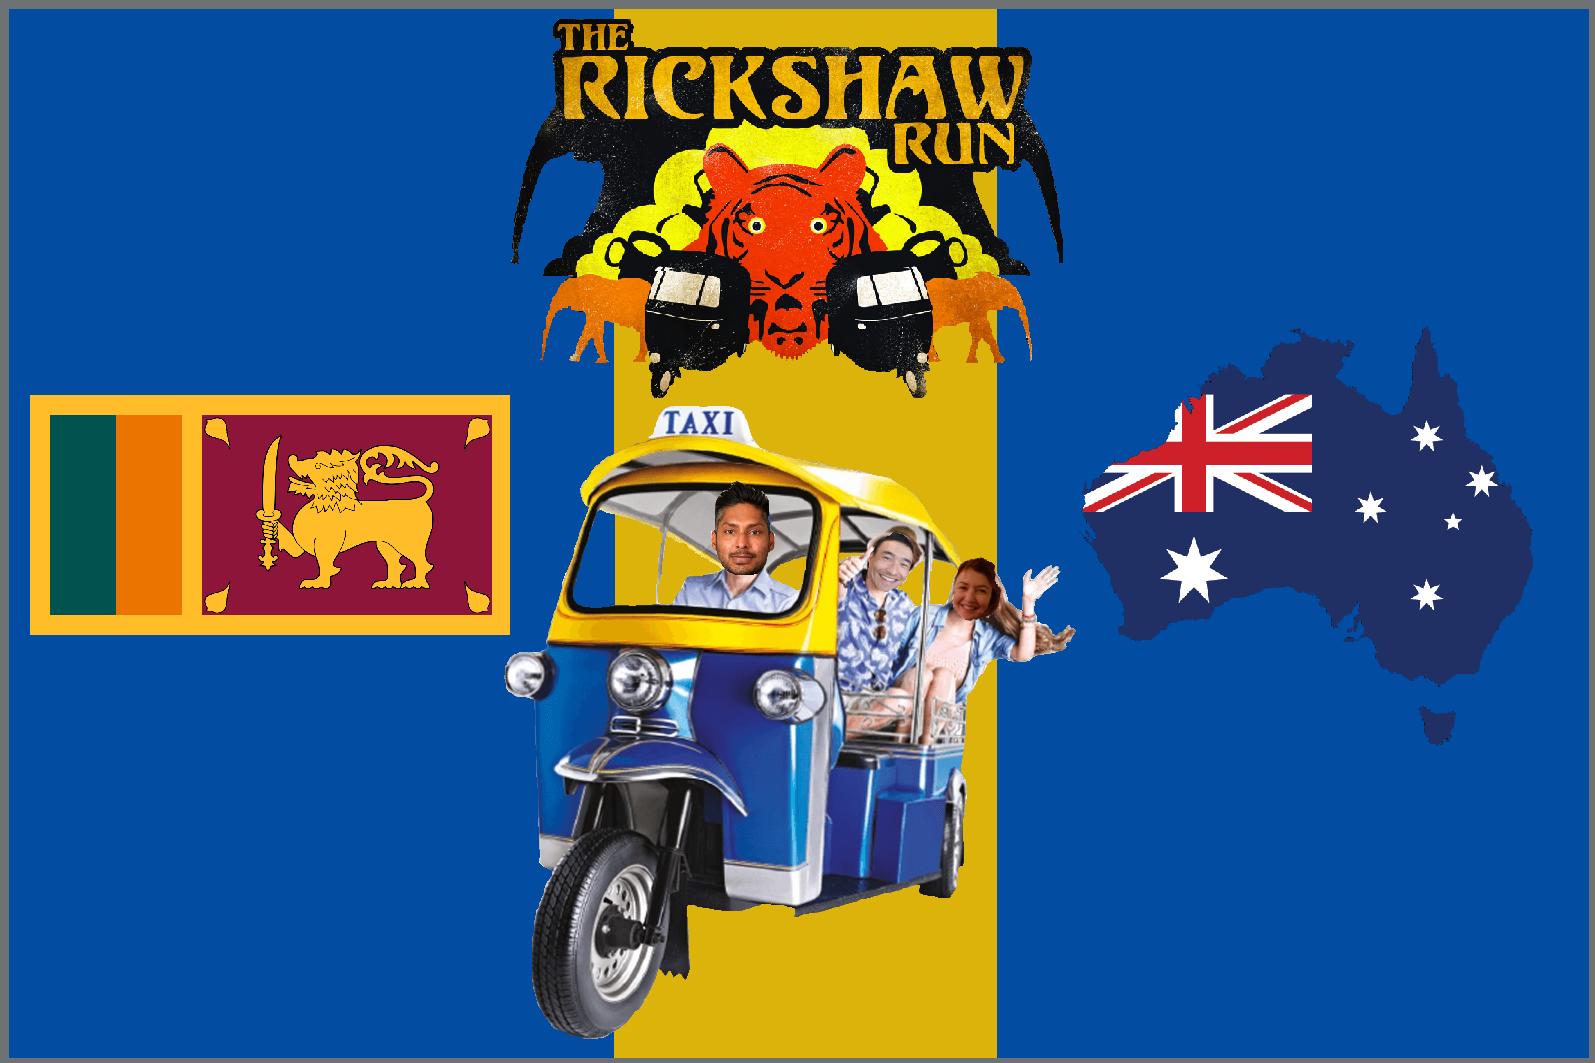 Driving a Tuk Tuk around Sri Lanka…. What could go wrong?.